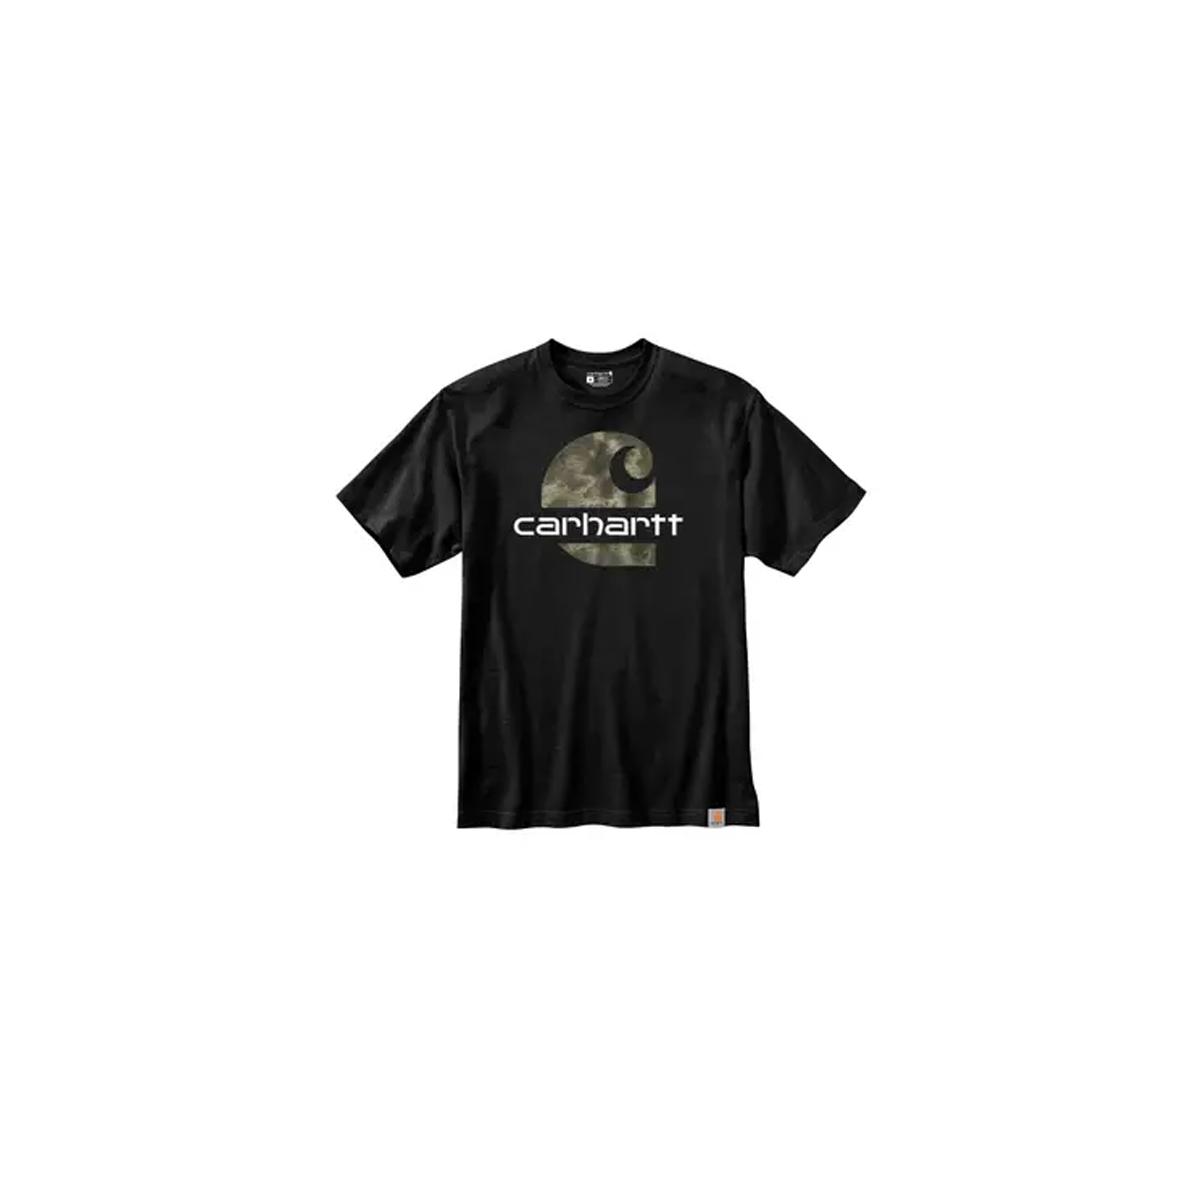 Men's Short Sleeve Graphic Tee, Black, swatch